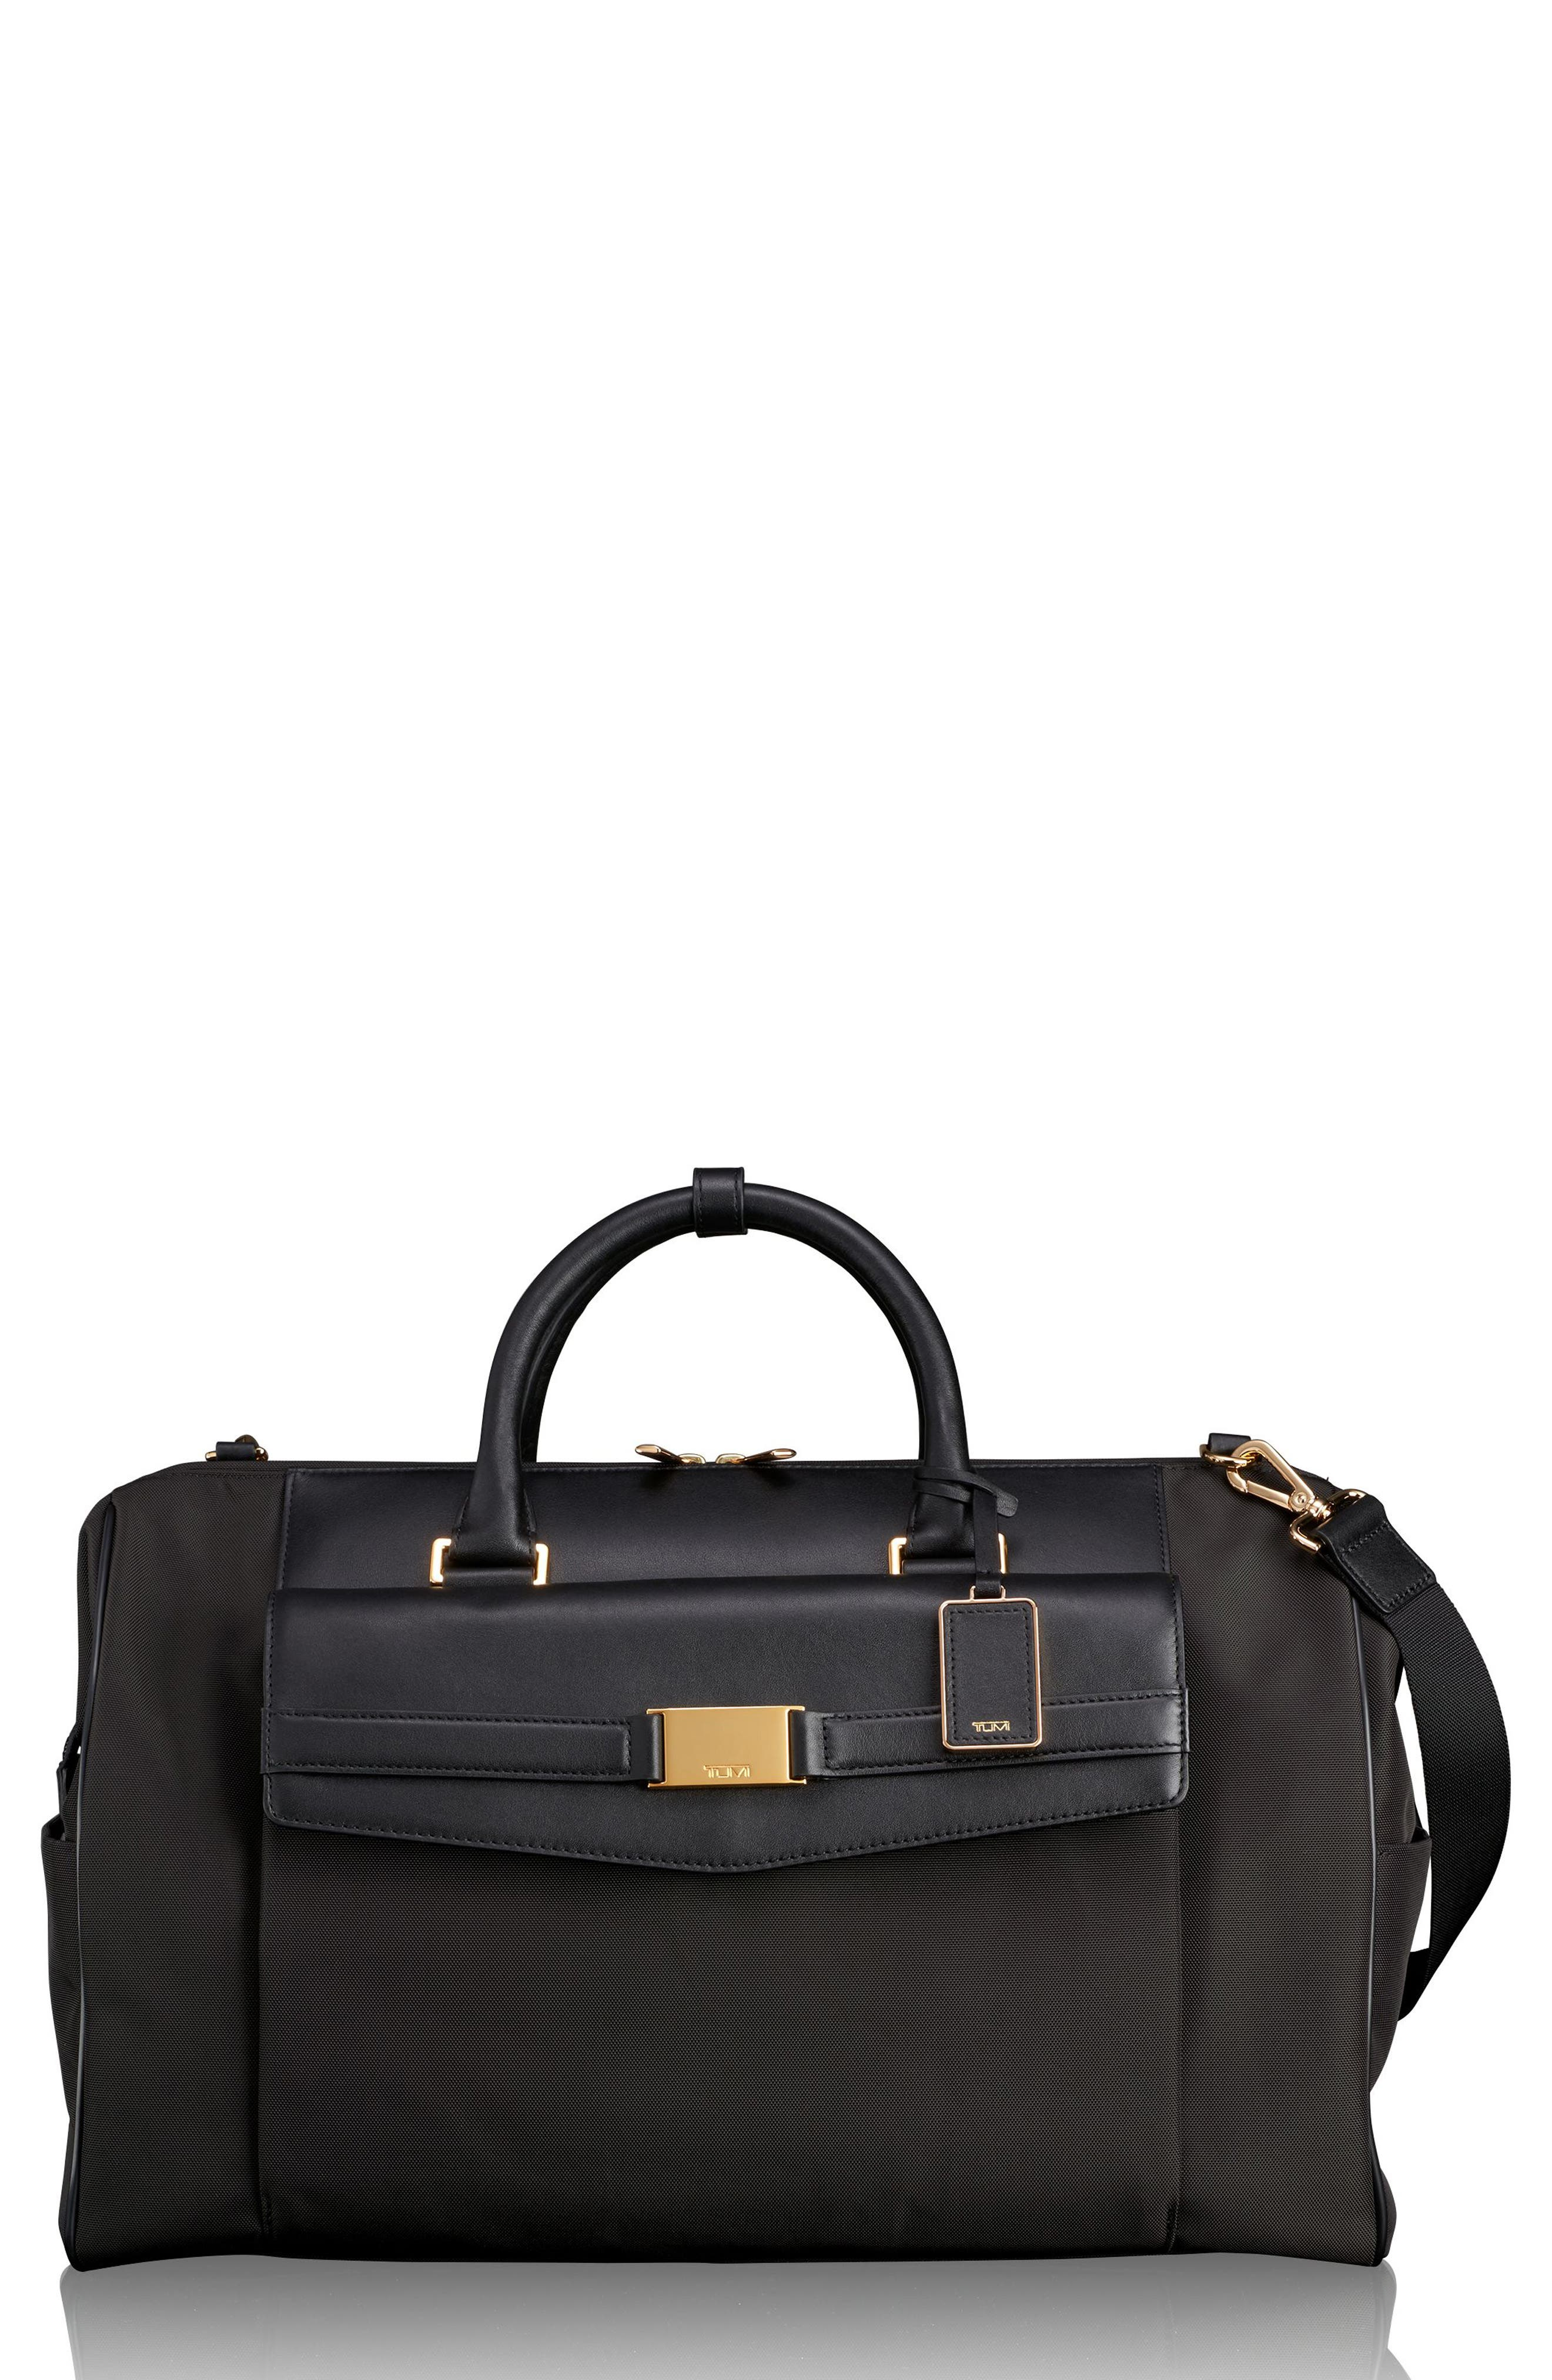 Larkin - Allendale Nylon Duffel Bag,                         Main,                         color, 001